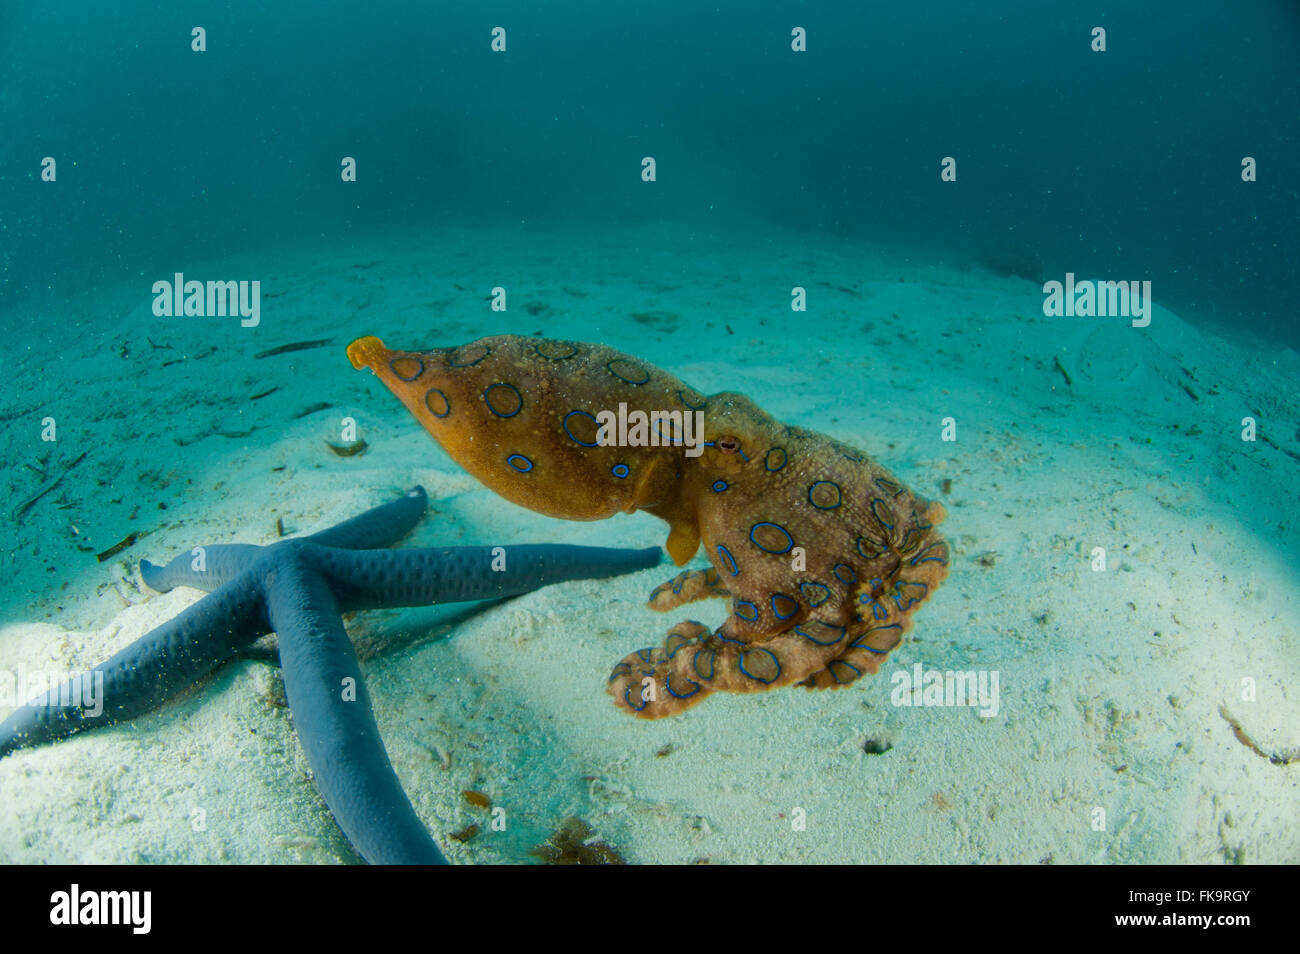 Blue-ringed octopus (Hapalochlaena lunulata) on white sandy area with blue starfish (Linckia laevigata) - Stock Image